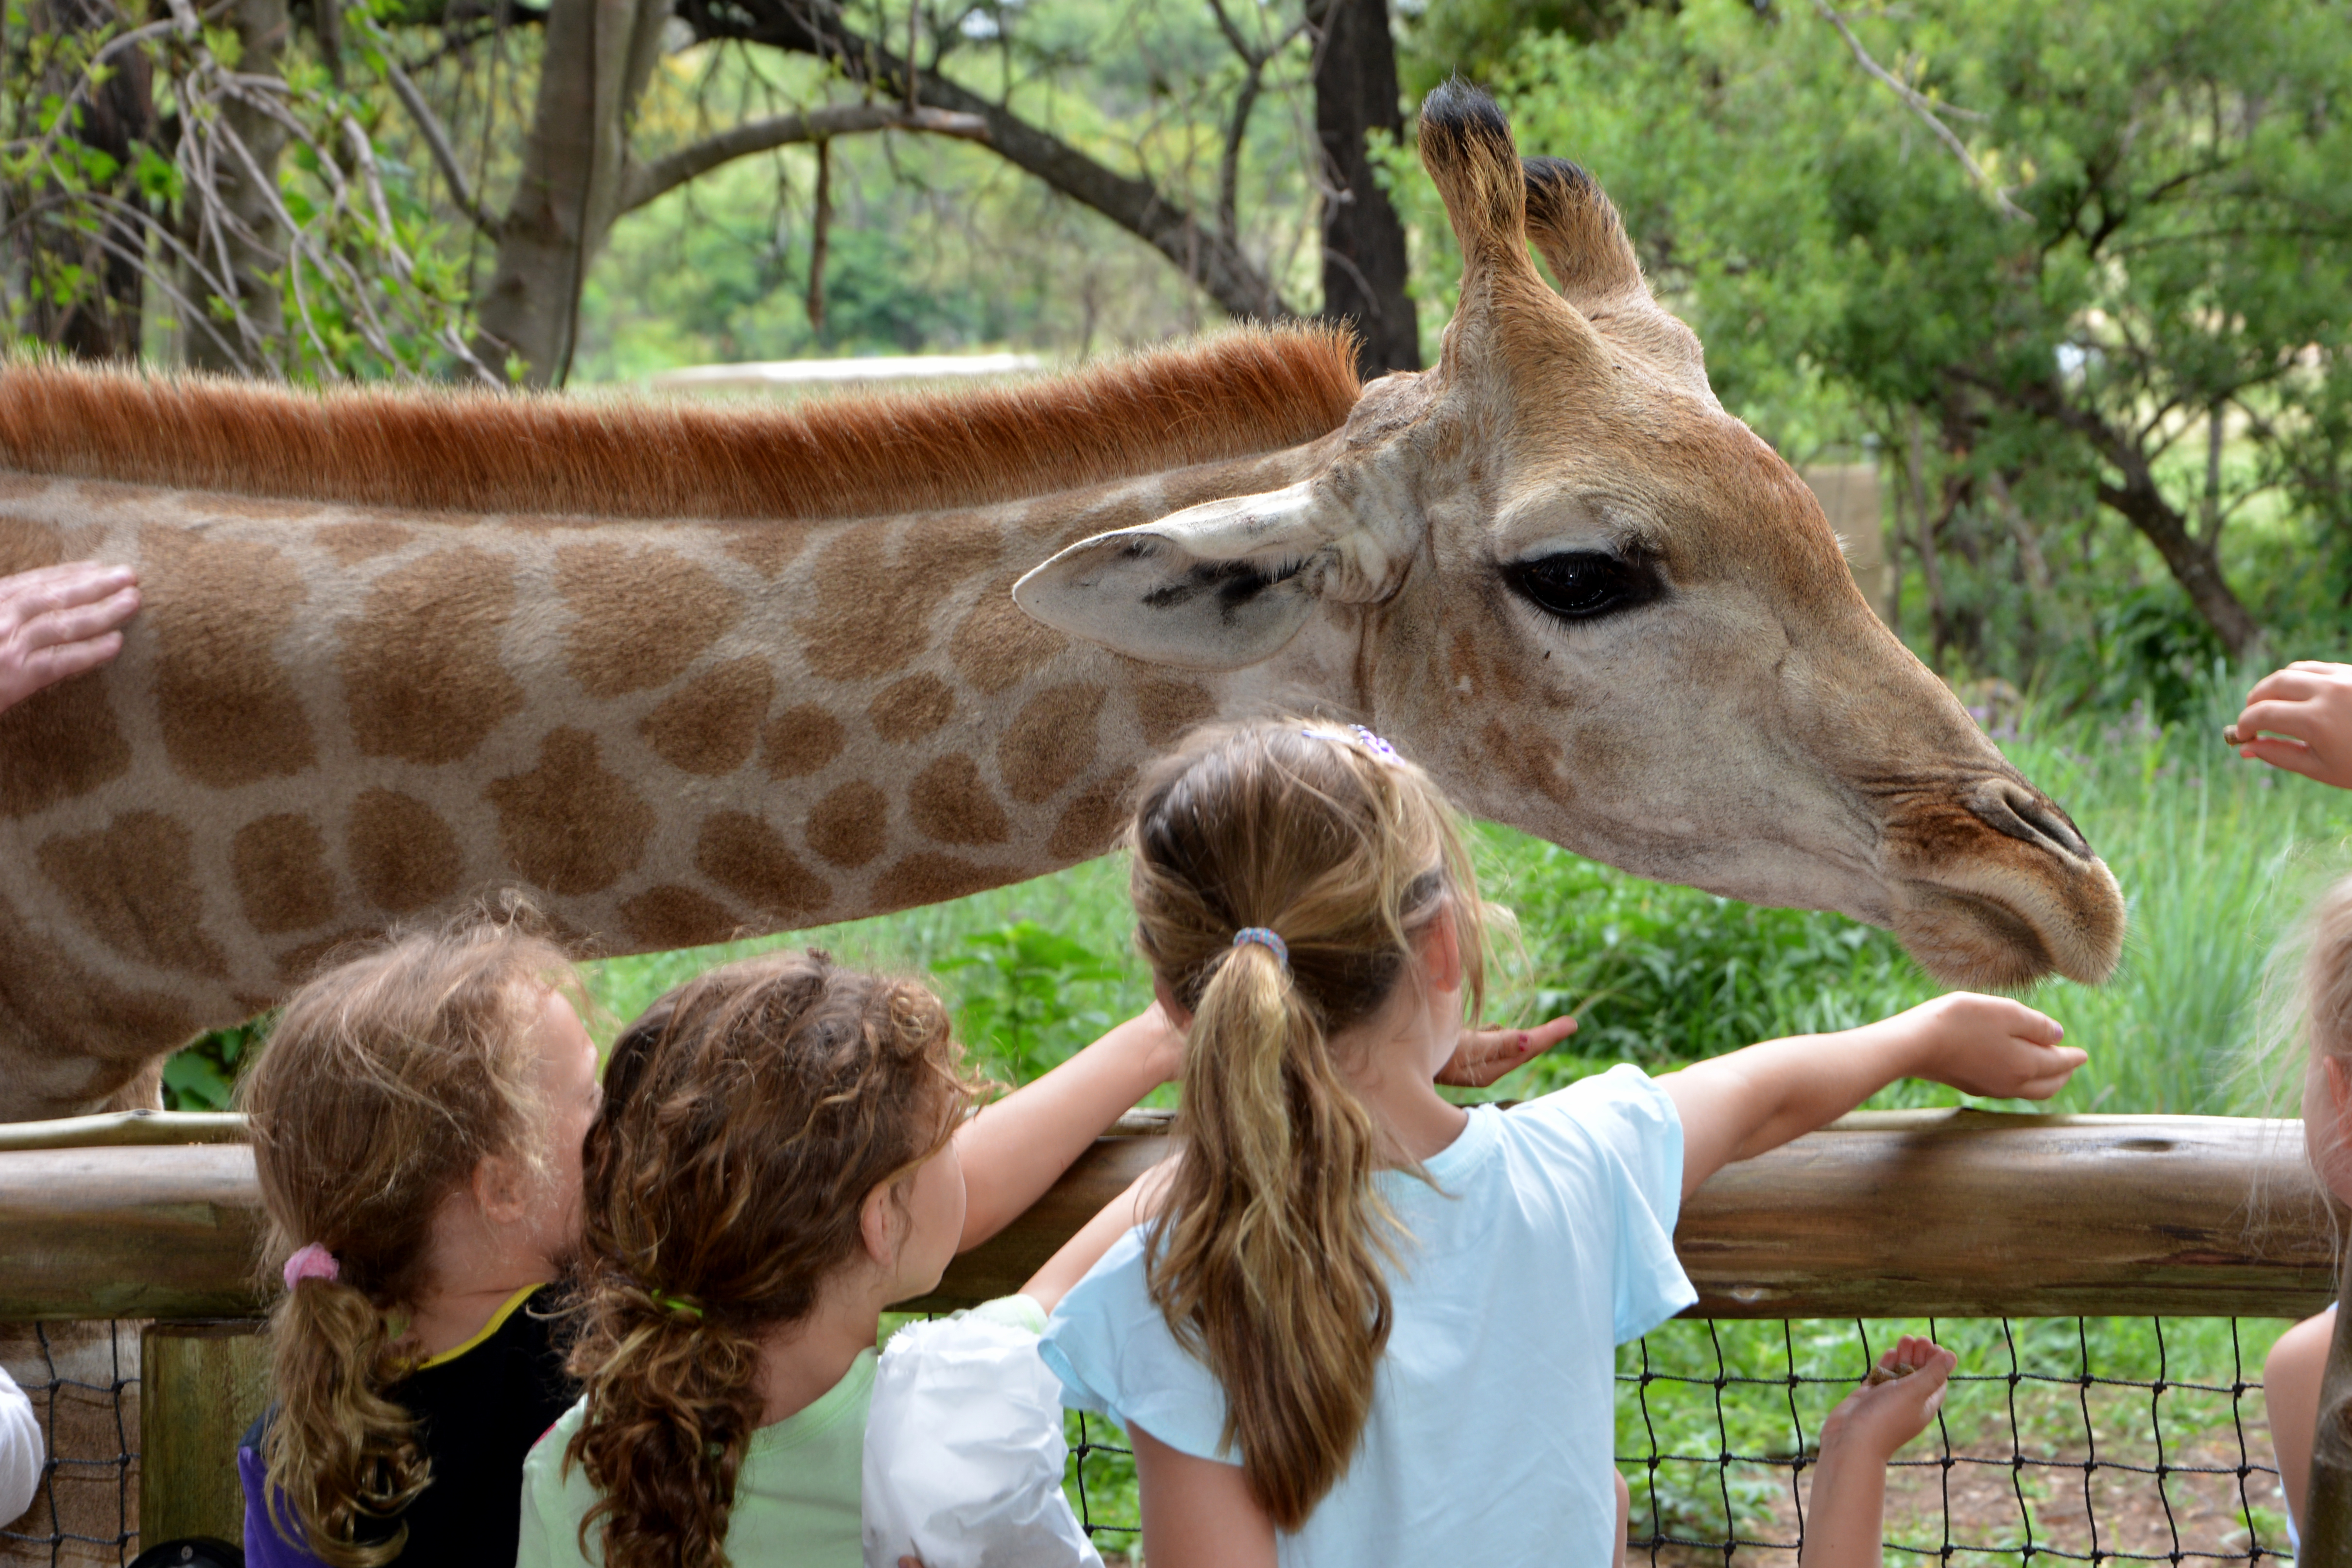 Children interacting with a giraffe